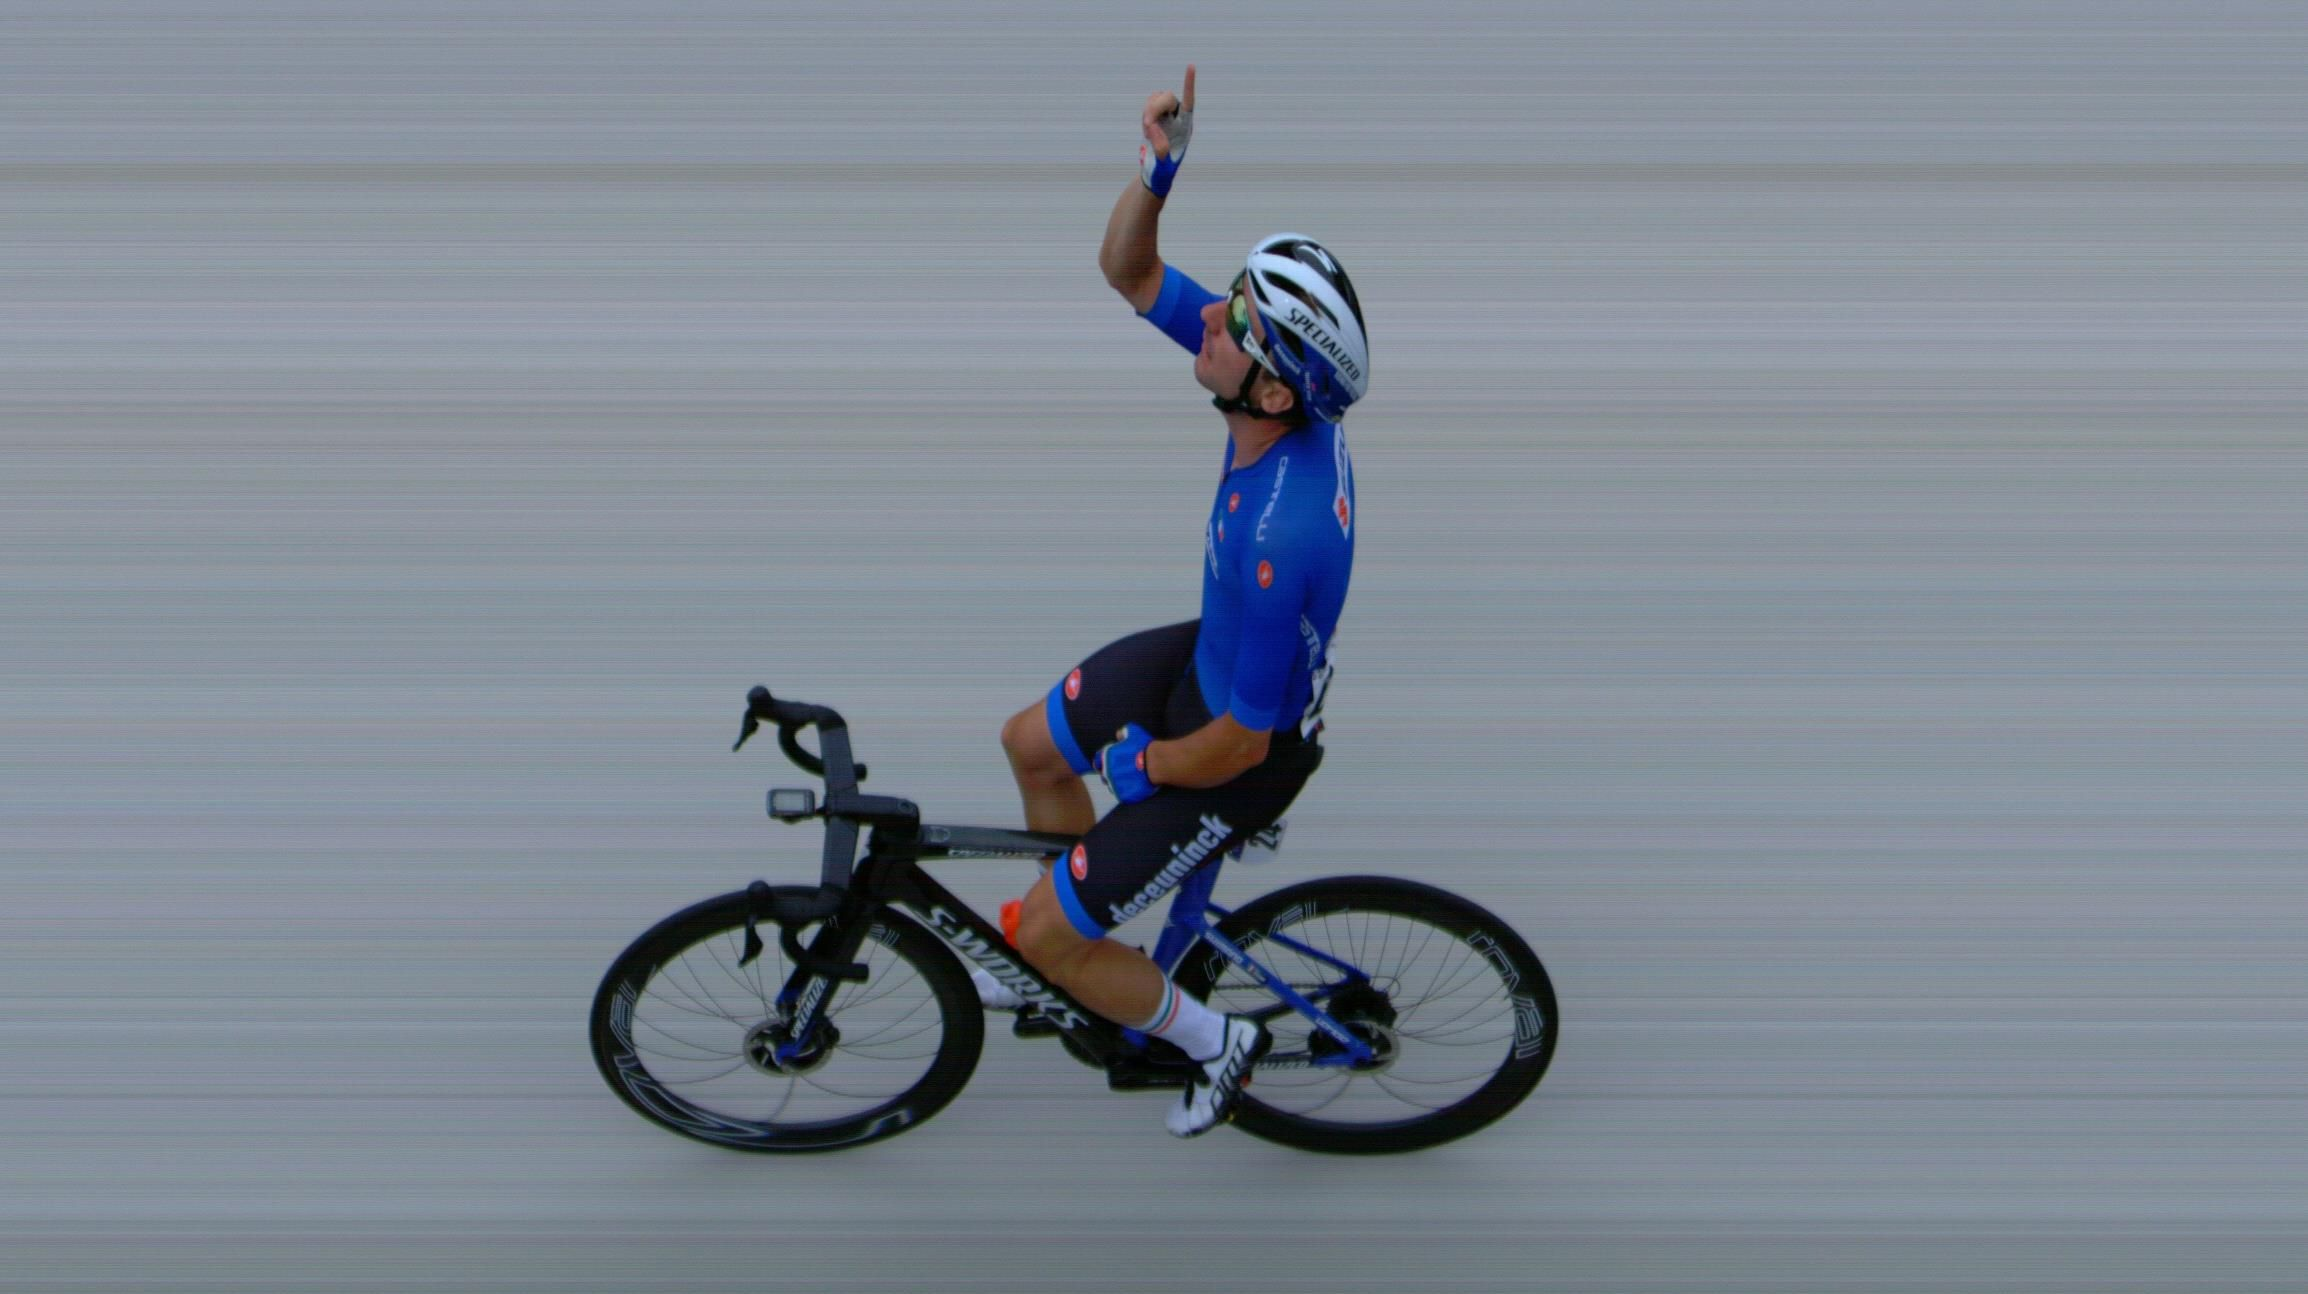 Eliva Viviani - Campione Europeo - Immagine Photofinish